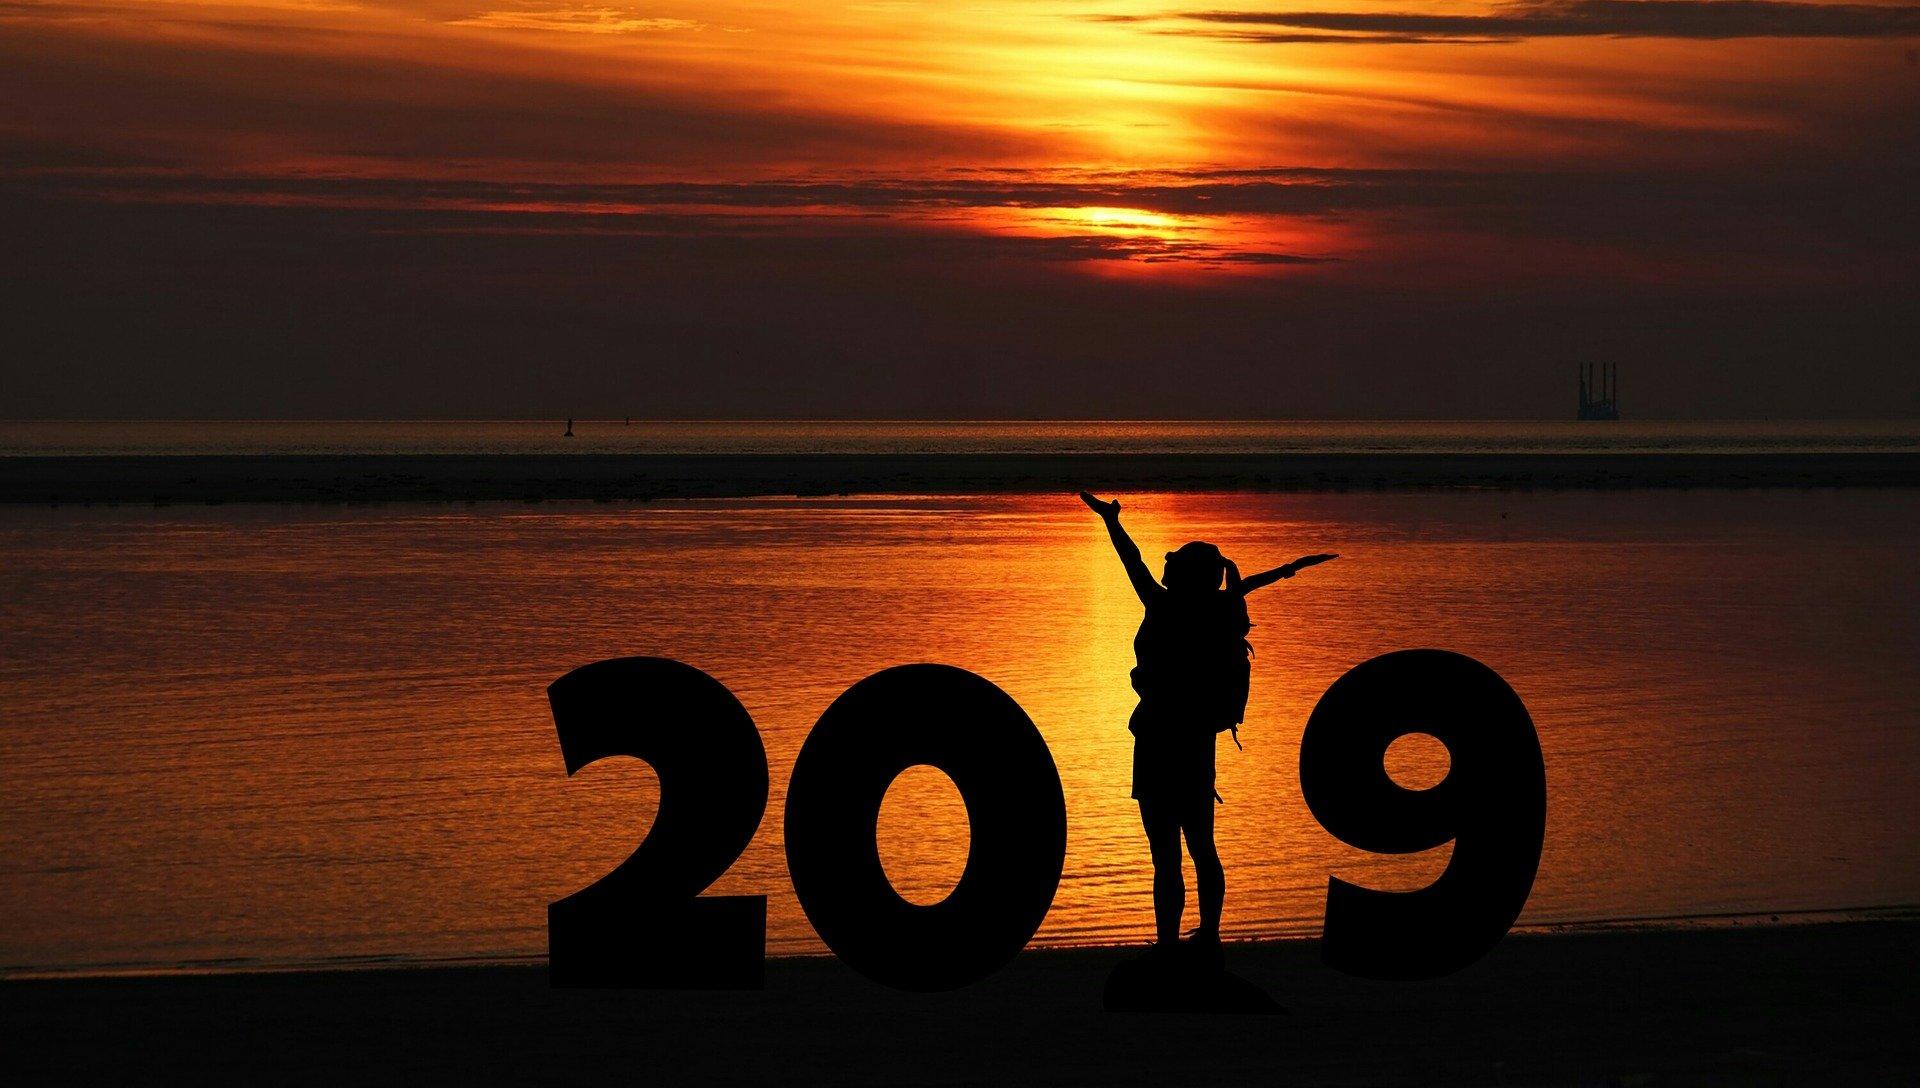 new-year-3357193_1920.jpg